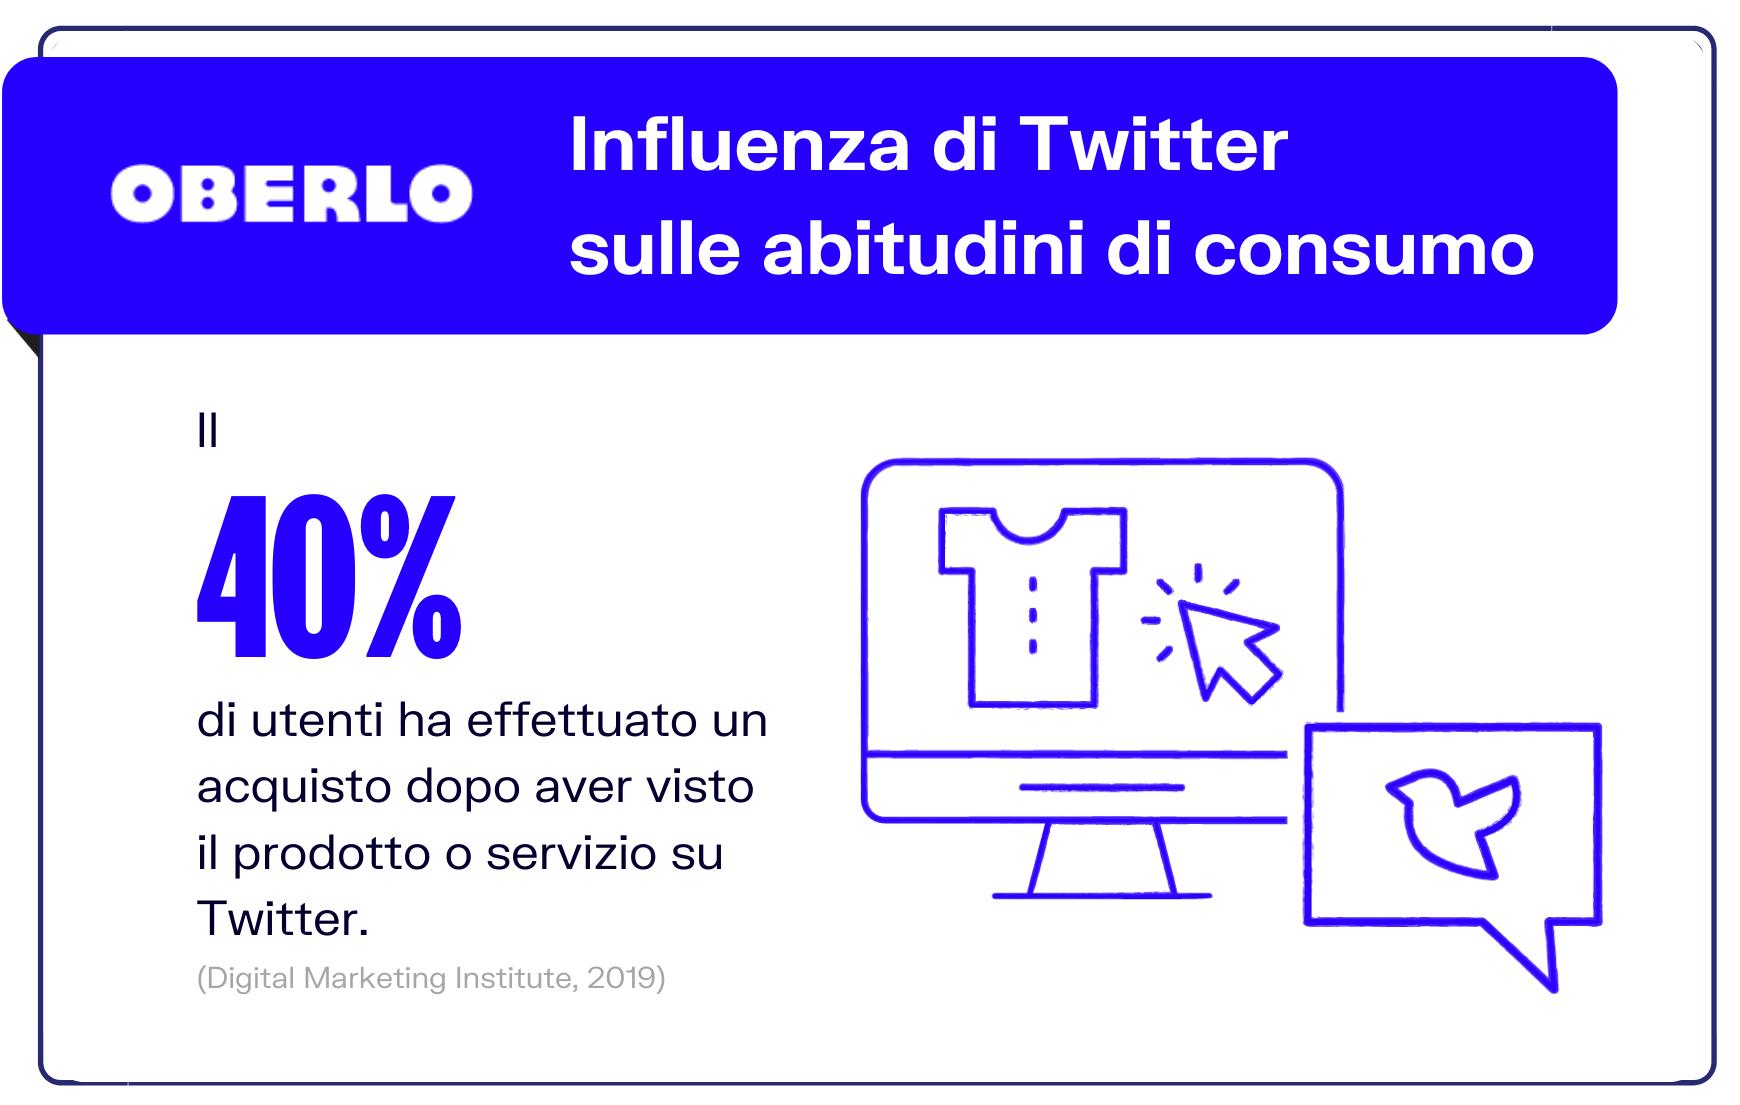 Twitter abitudini di consumo